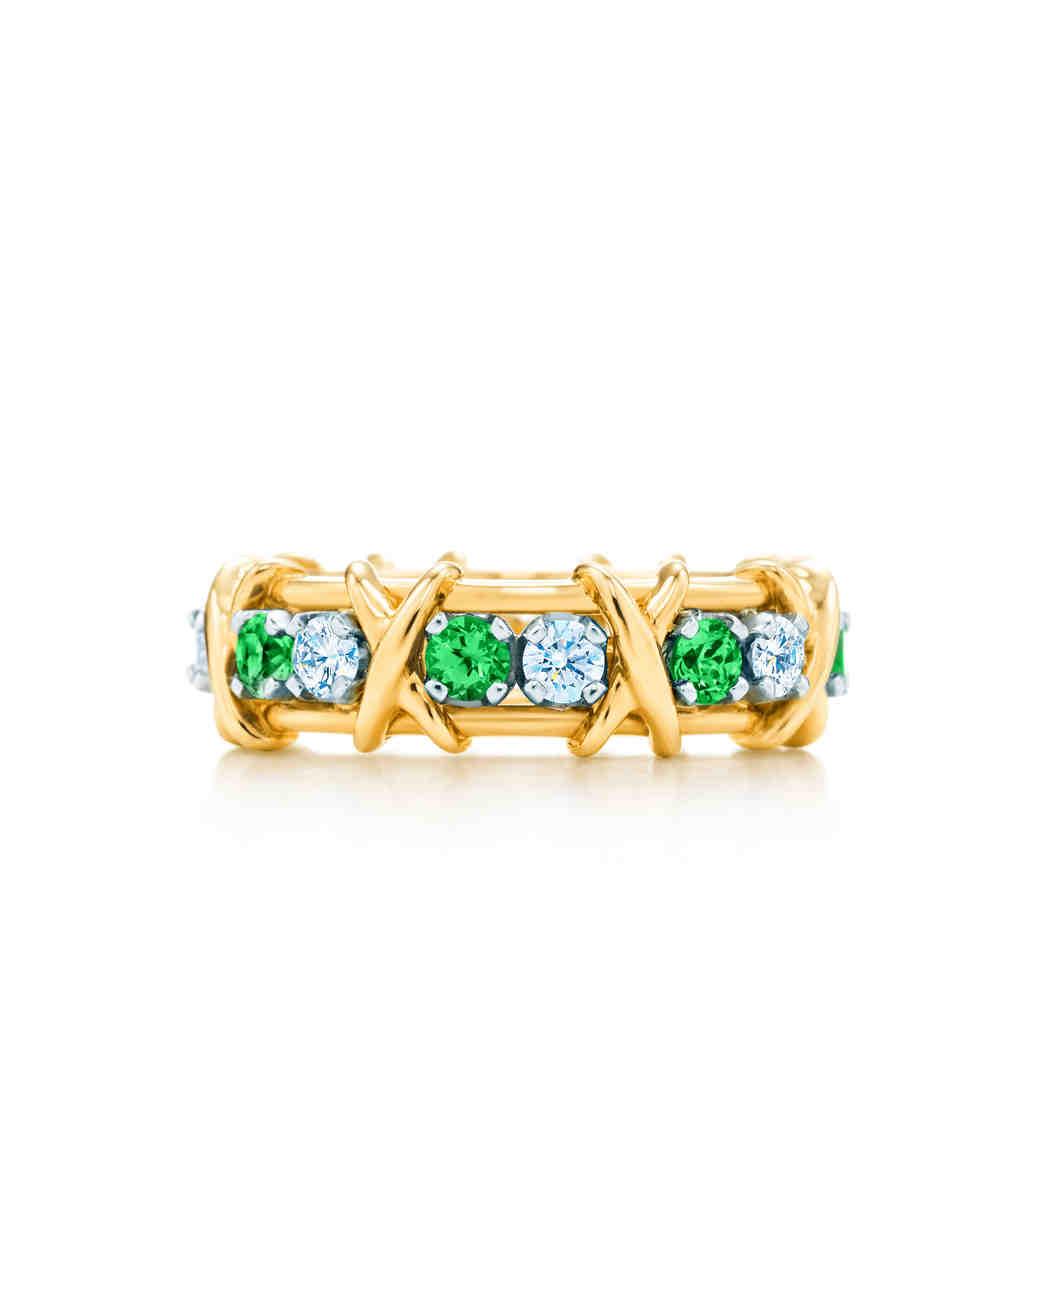 colored-engagement-rings-tiffany-diamonds-tsavorites-0316.jpg